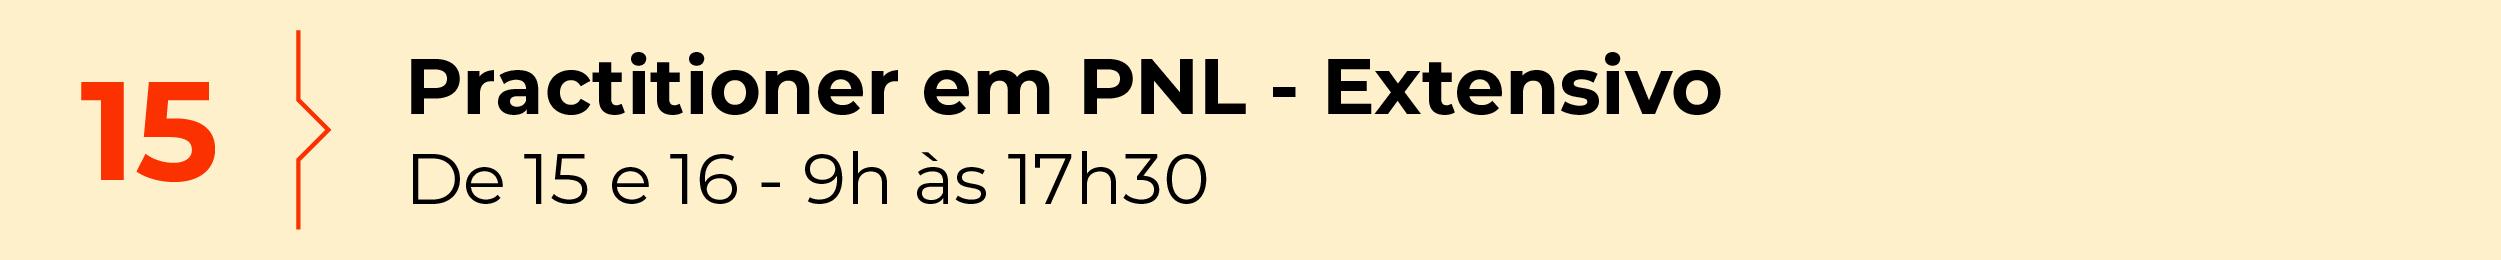 Practitioner em PNL - Extensivo